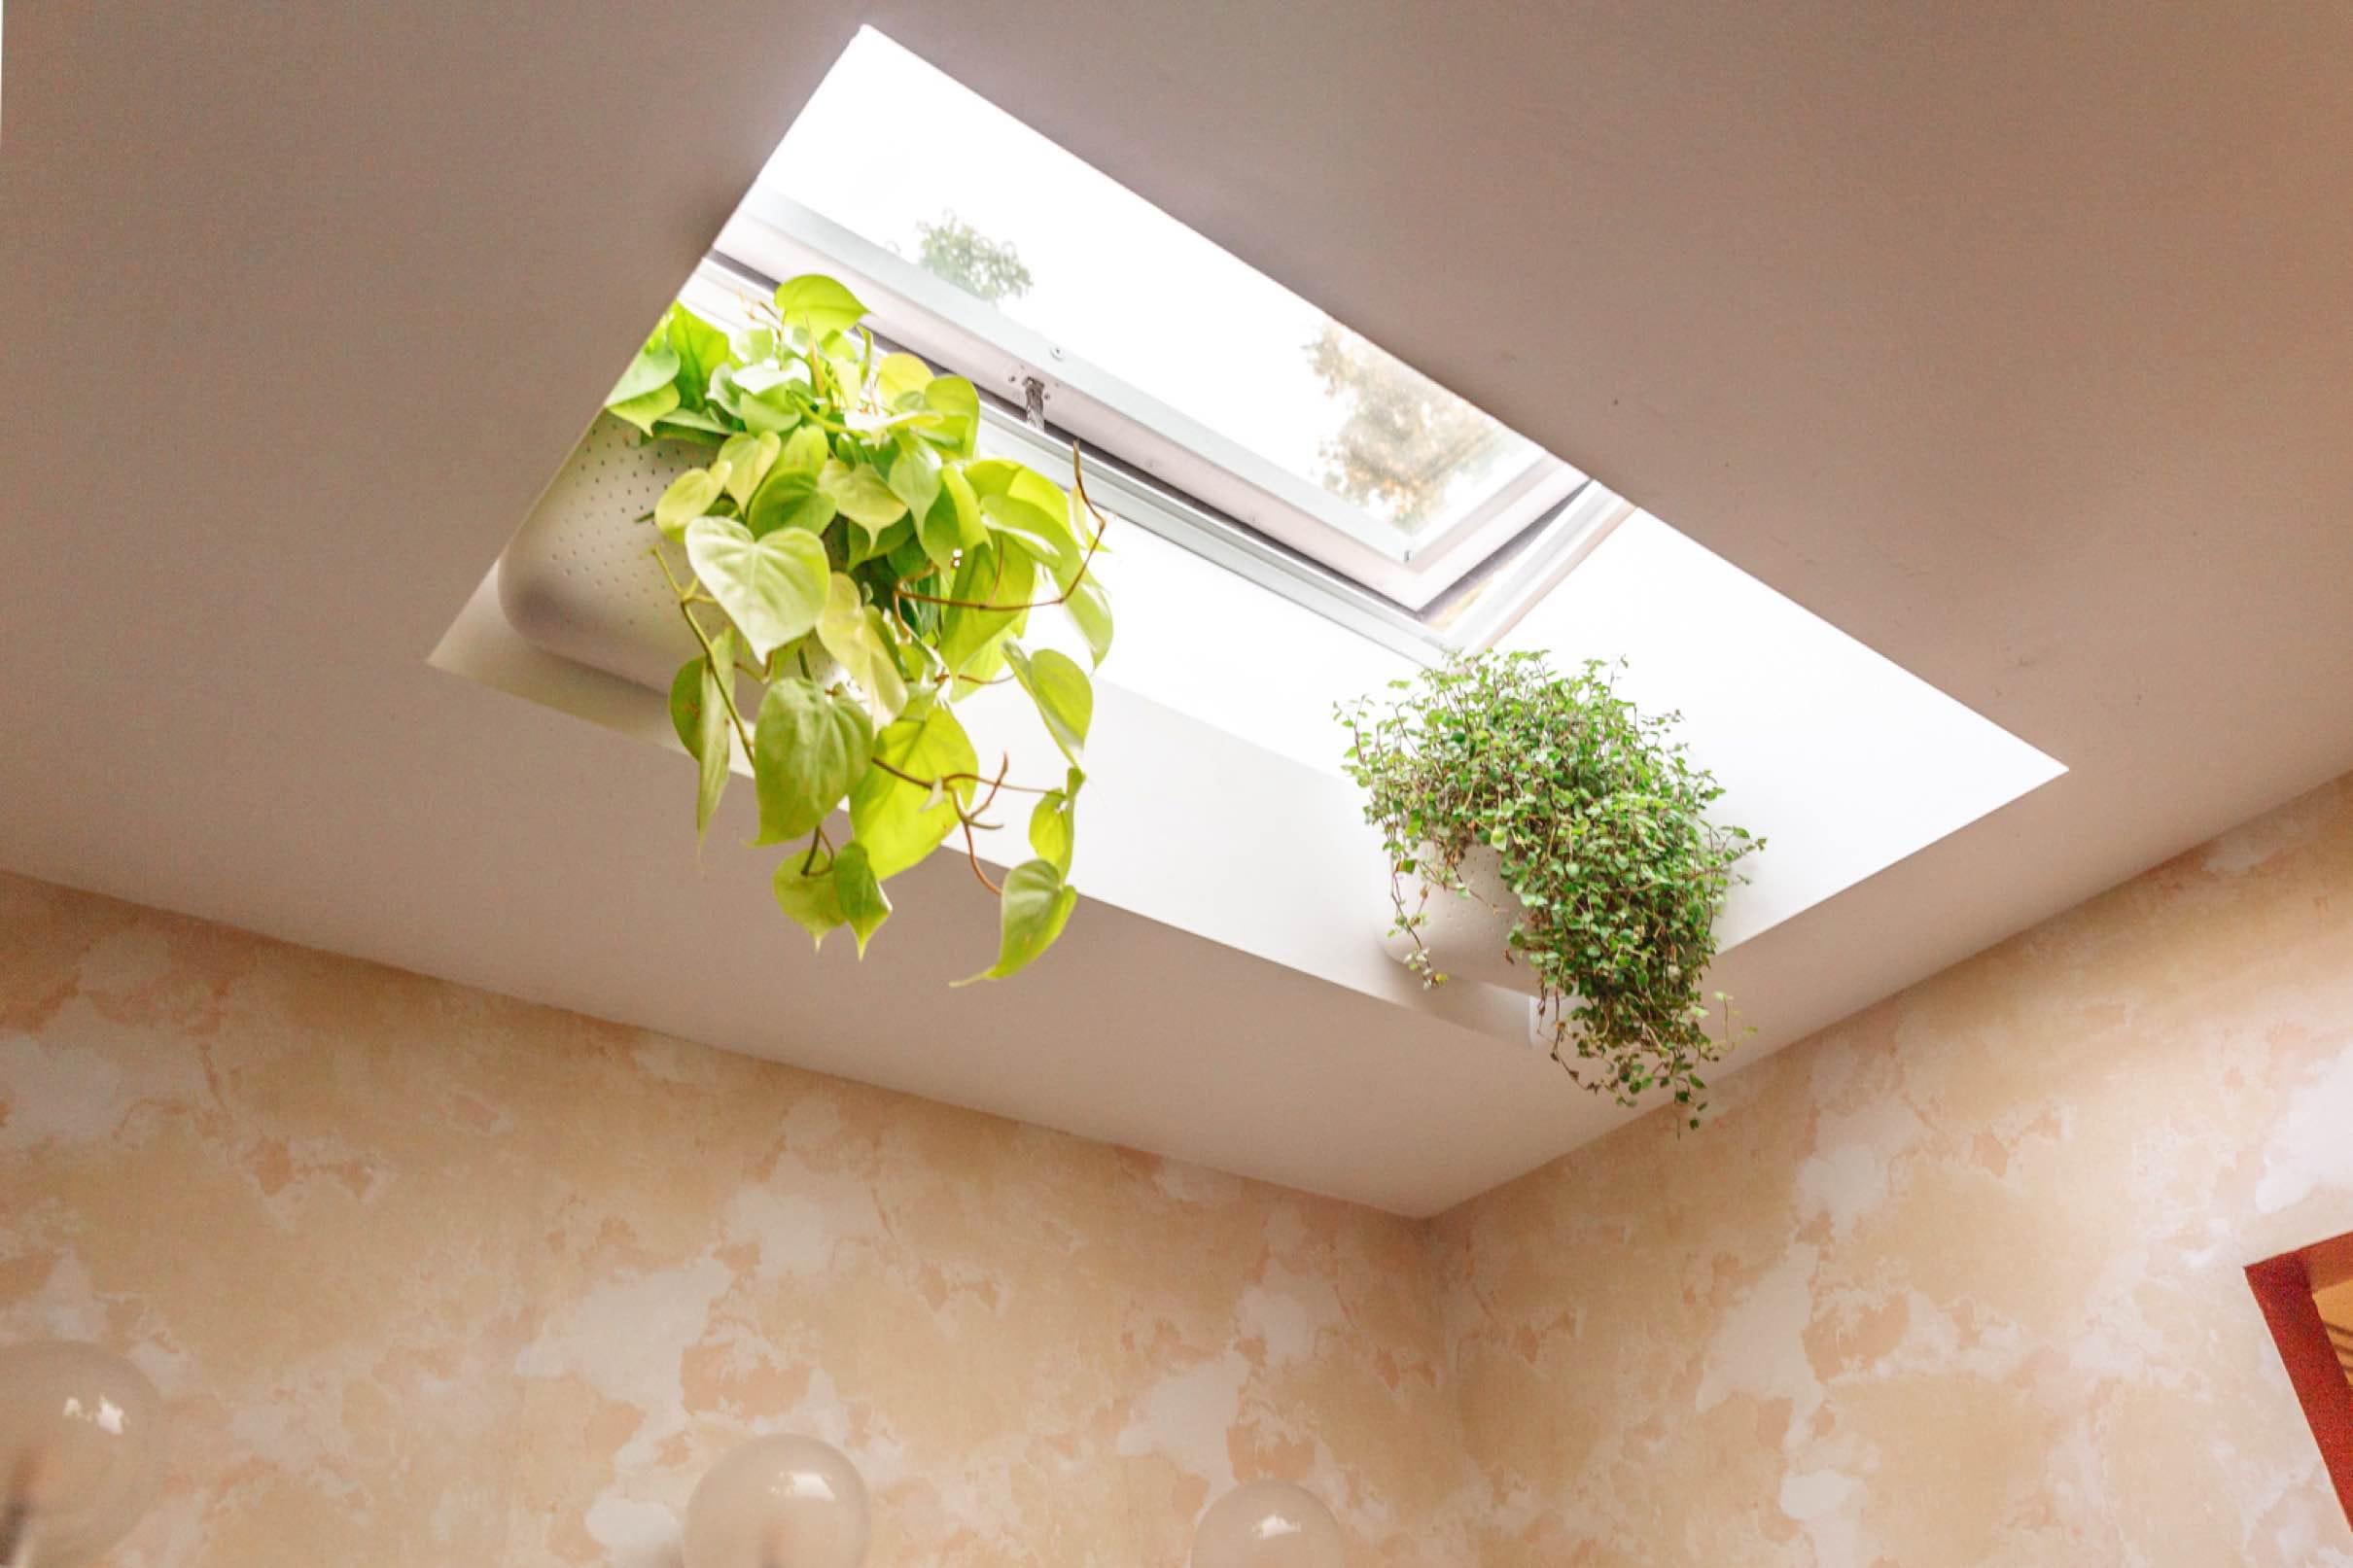 Studio plumb skylight with plantstmb